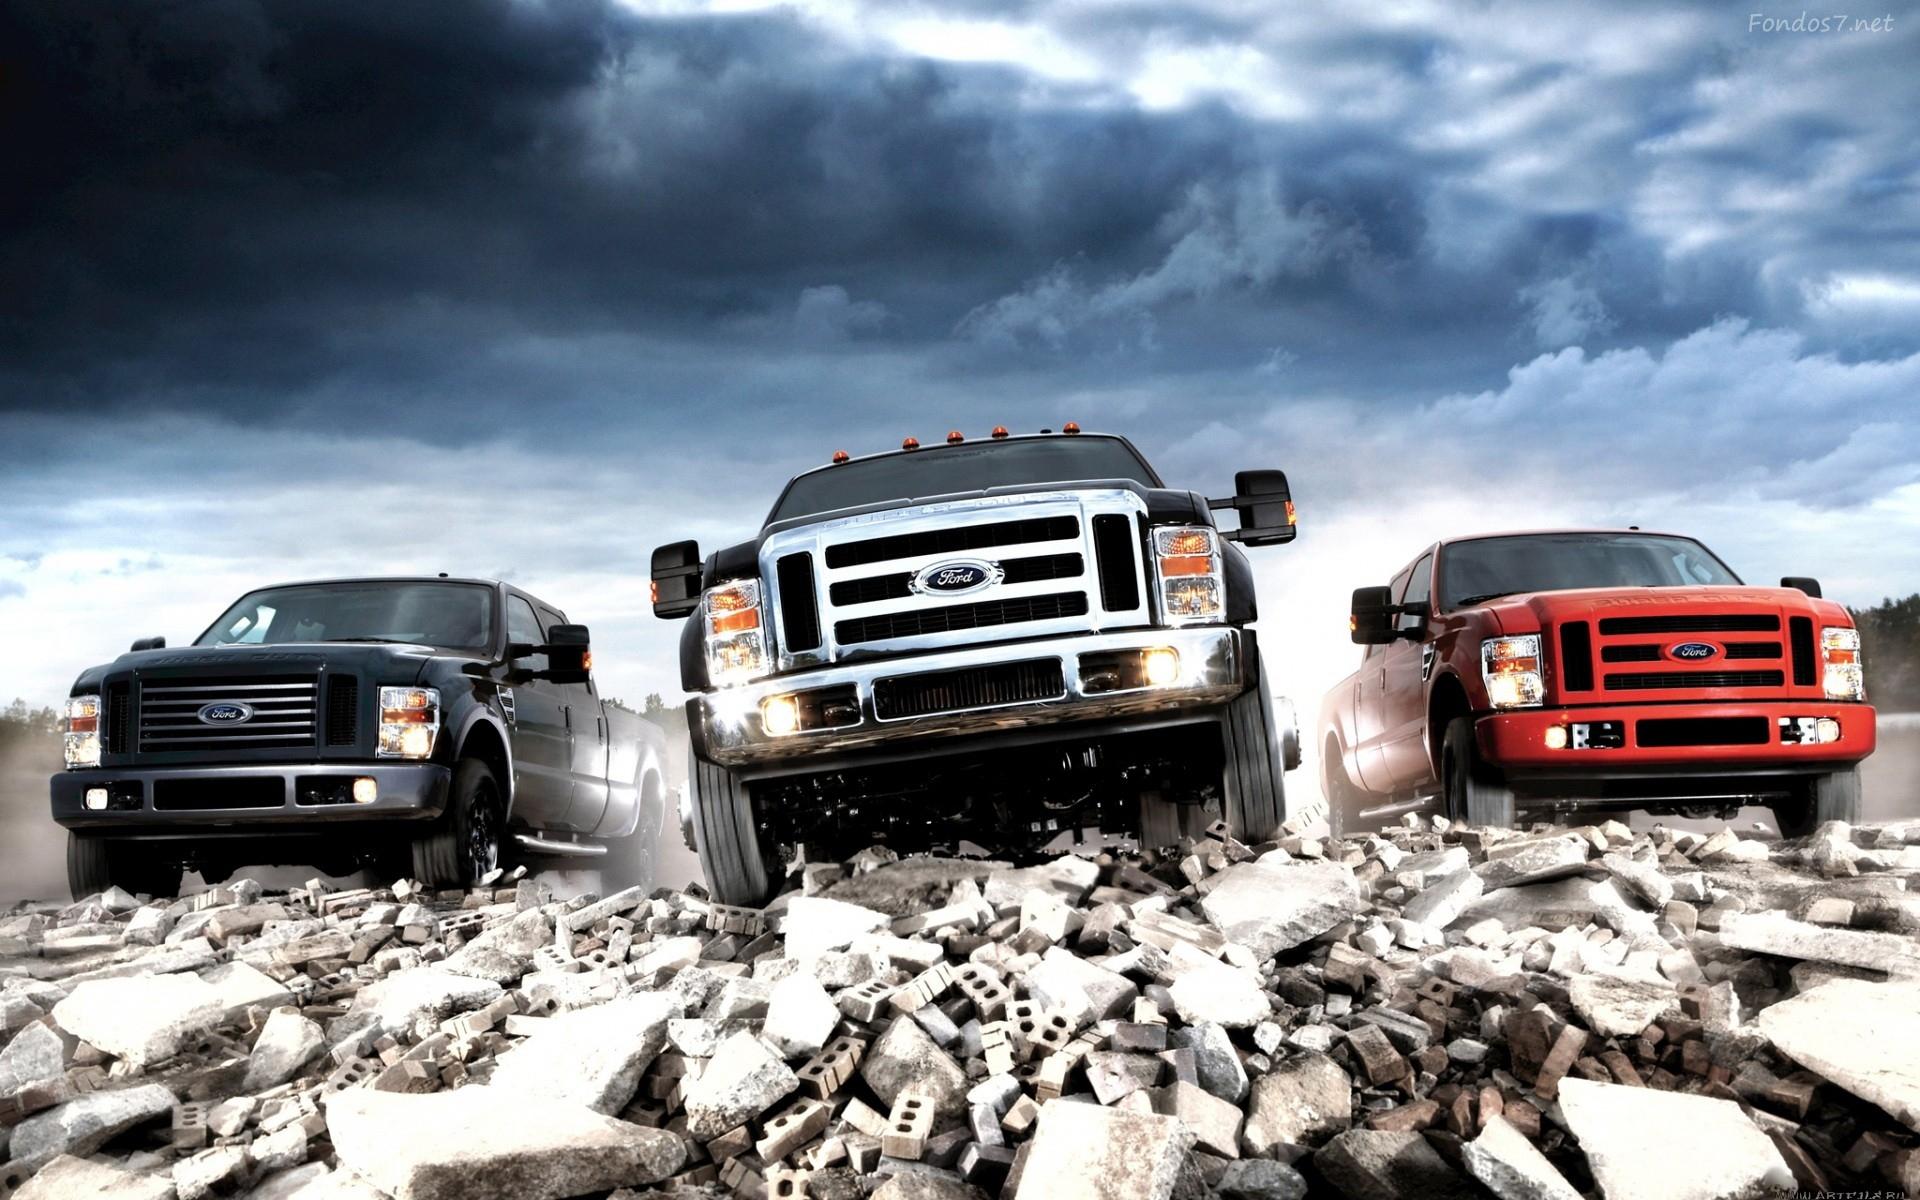 Fondos de pantalla camionetas ford hd widescreen Gratis imagenes 6518 1920x1200